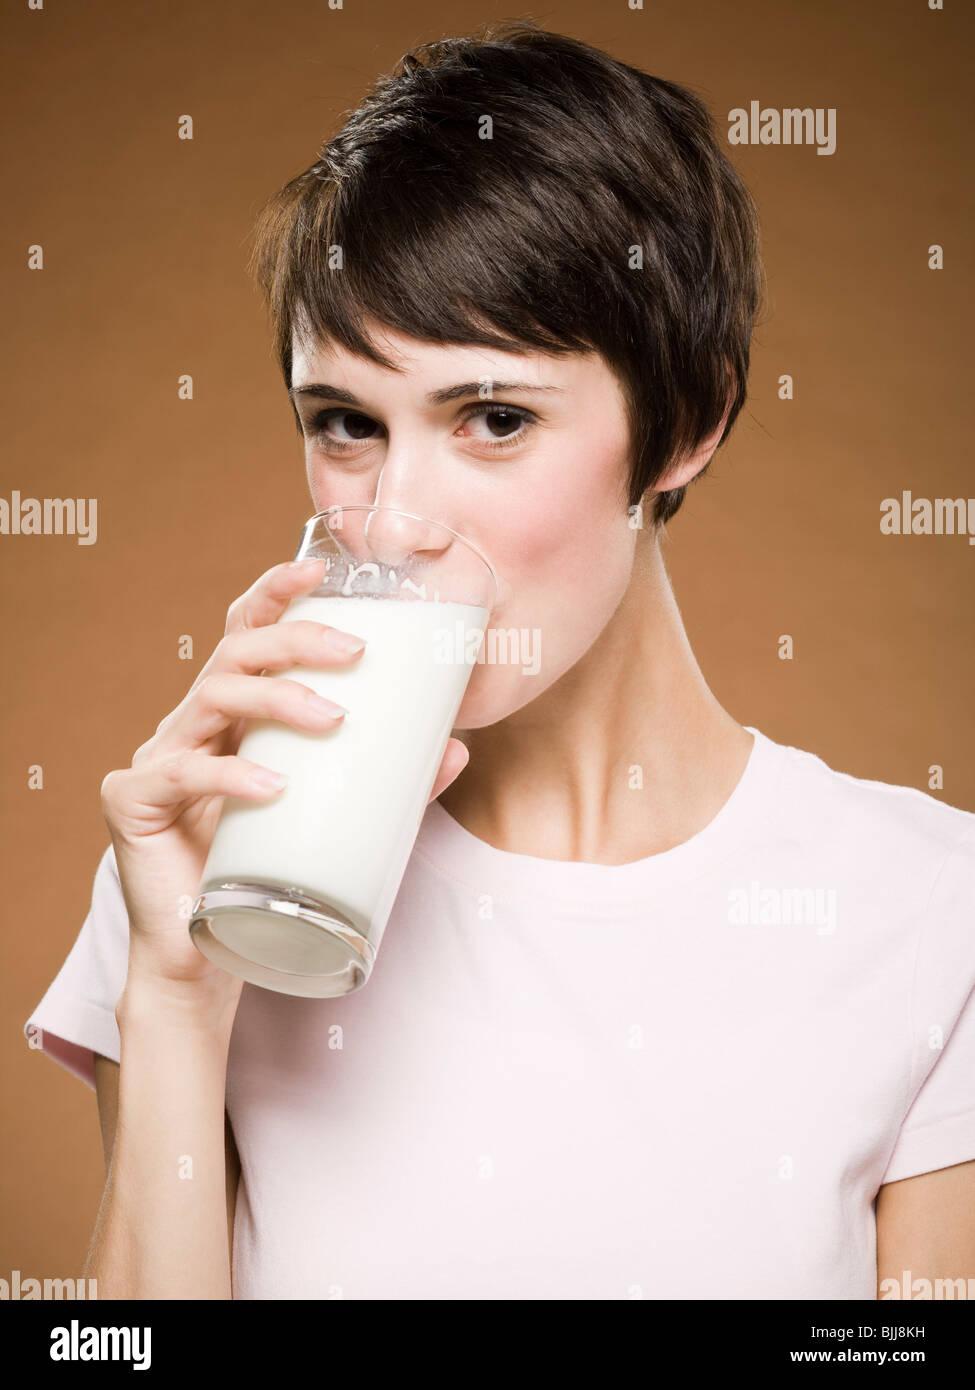 Woman drinking glass of milk Stock Photo